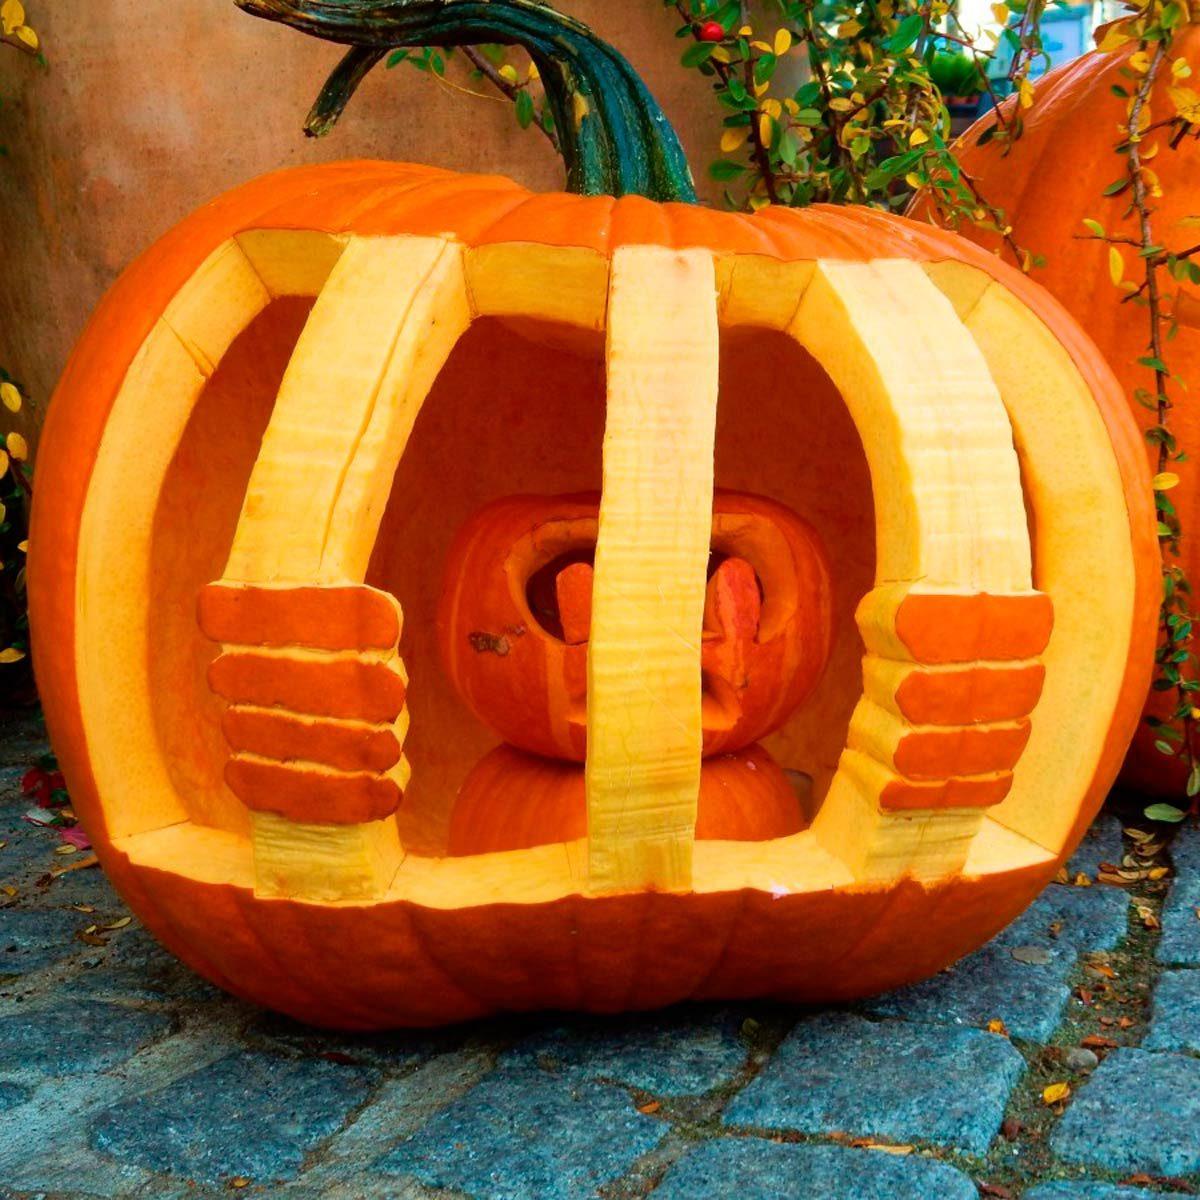 Jail cell pumpkin carving